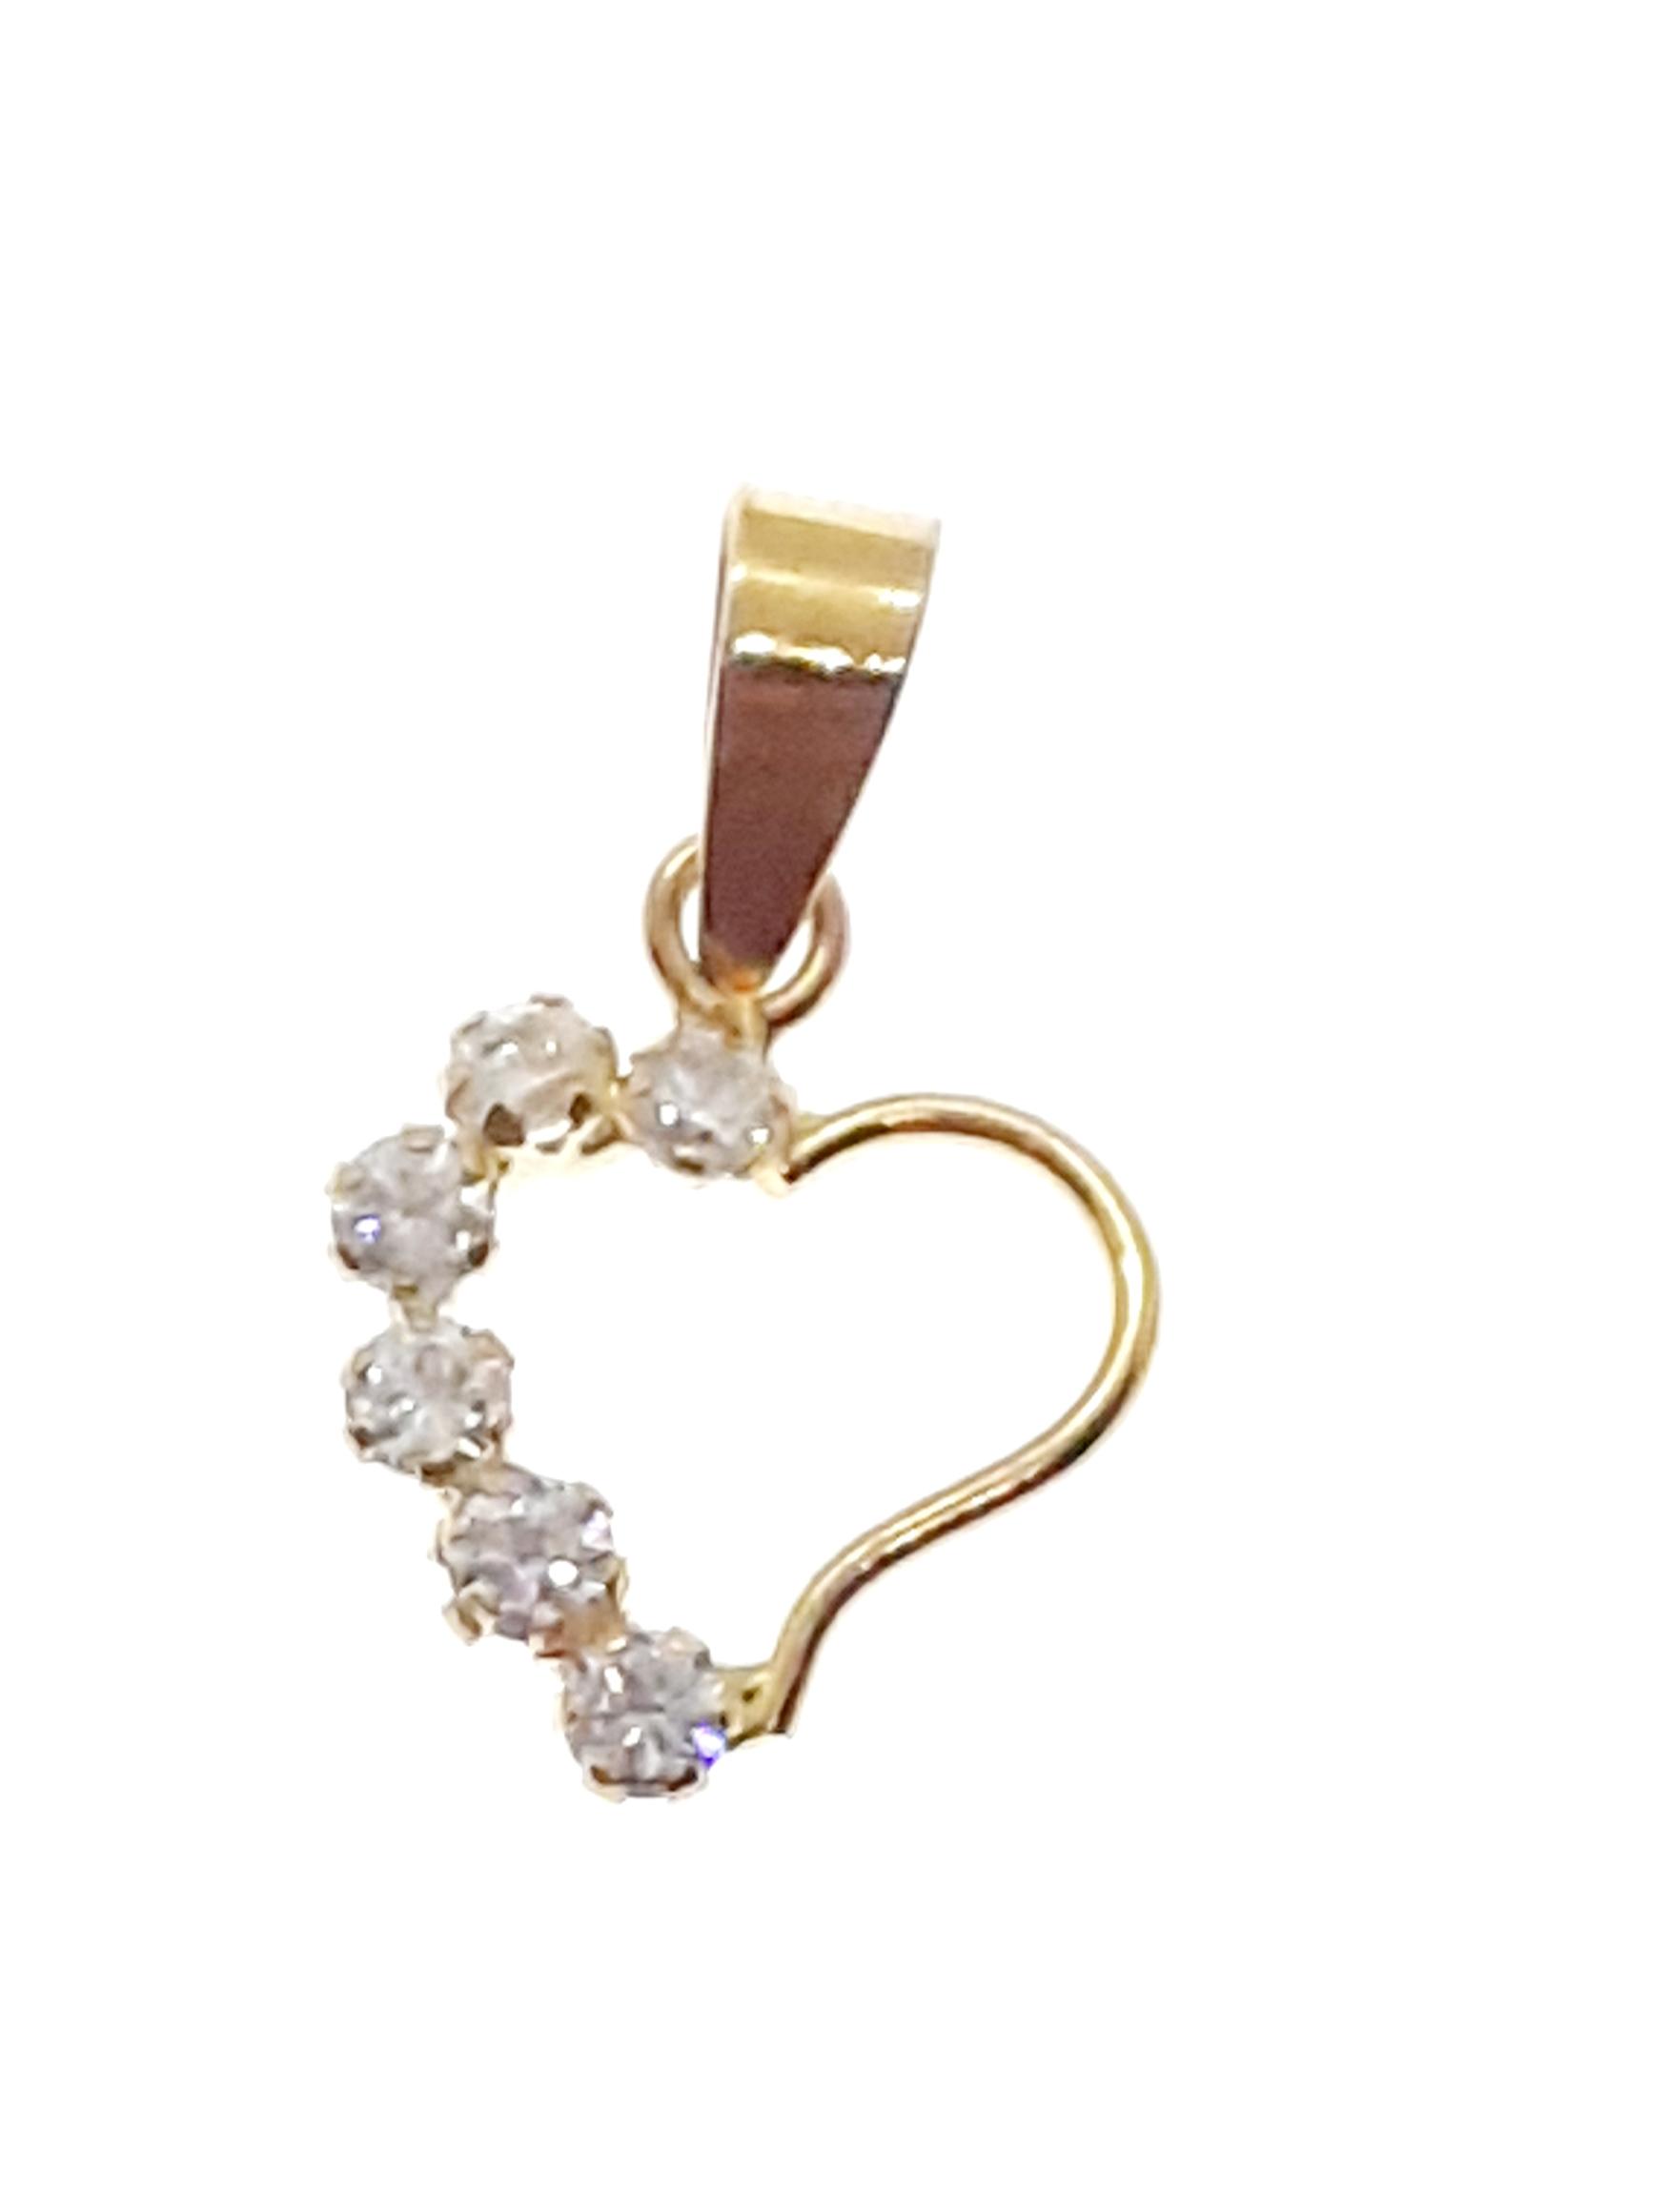 Sensi joyas jewellery Granada silver engagement18K GOLD AND ZIRCONS  PENDANT